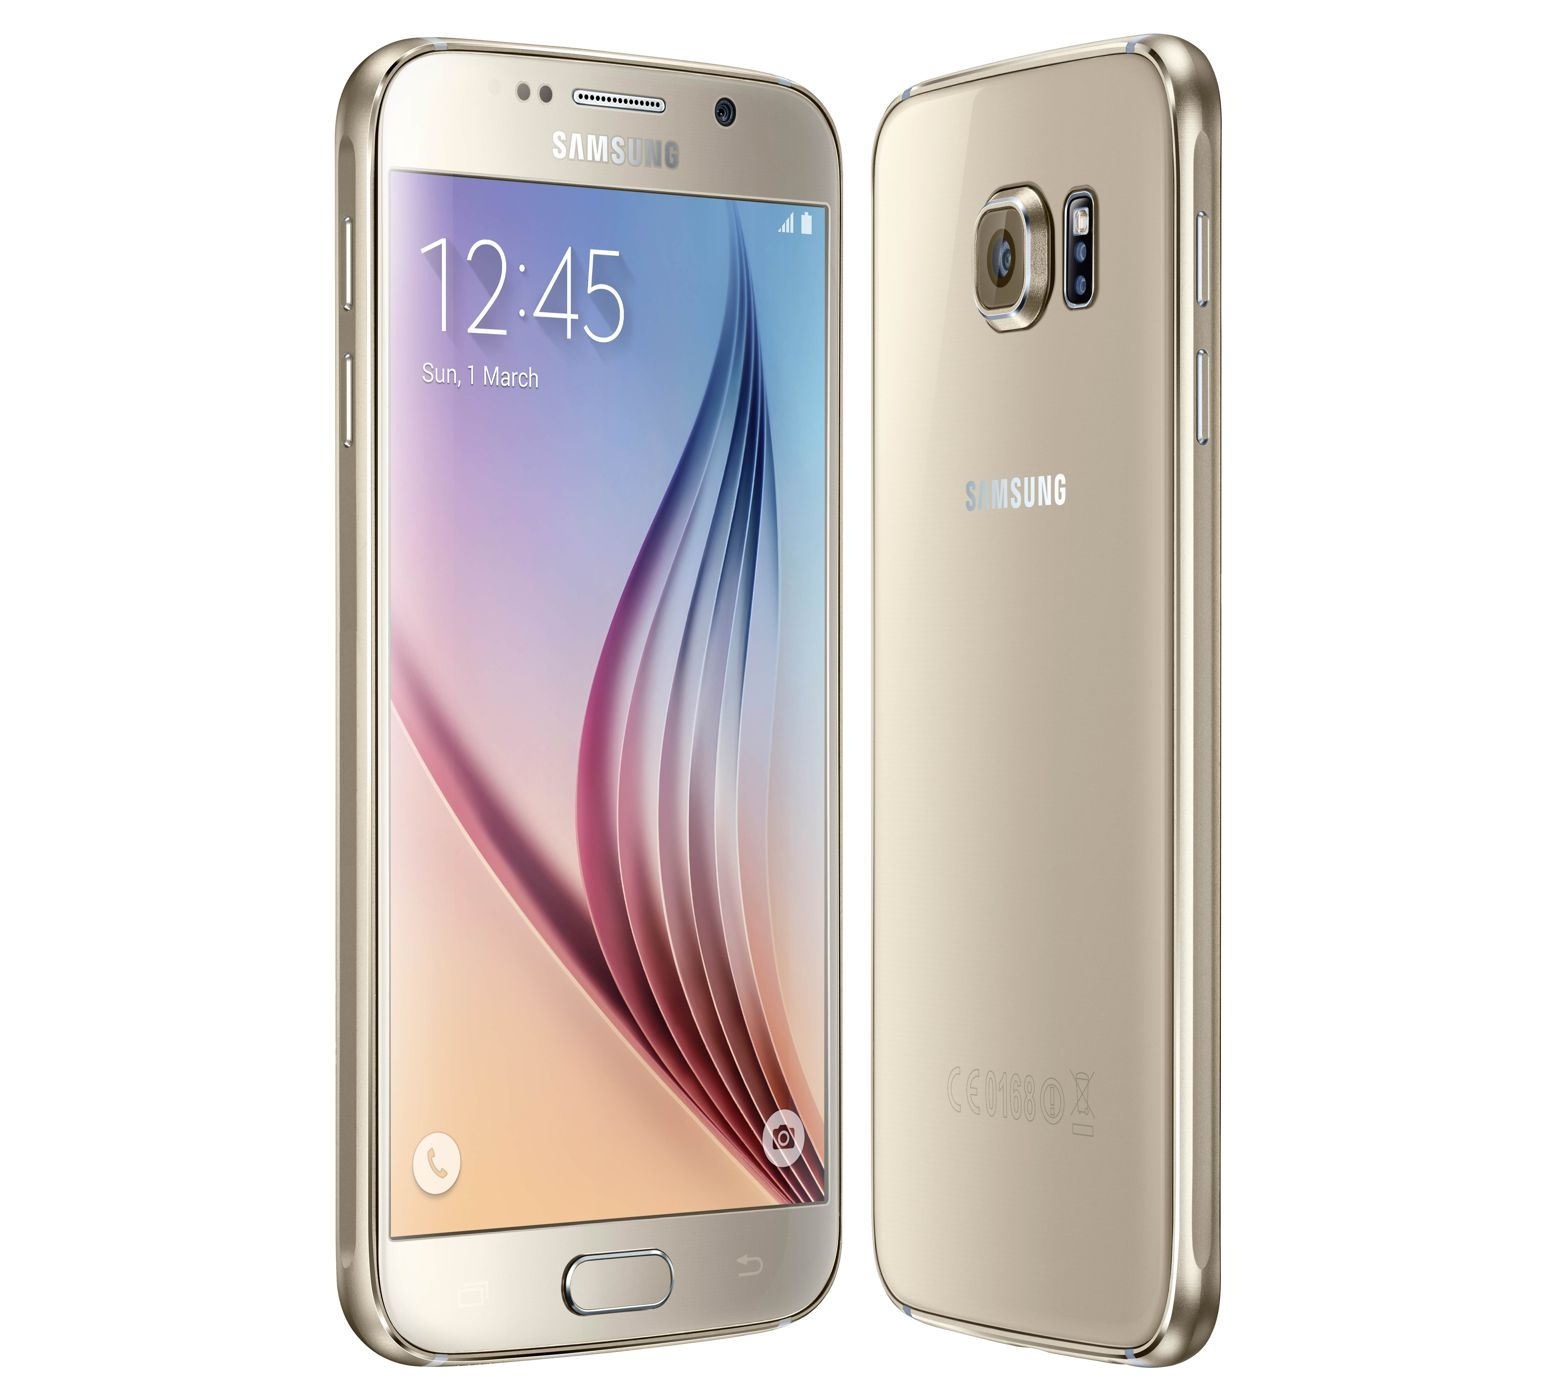 Samsunf Platinum: Samsung Galaxy S6 Gold Platinum